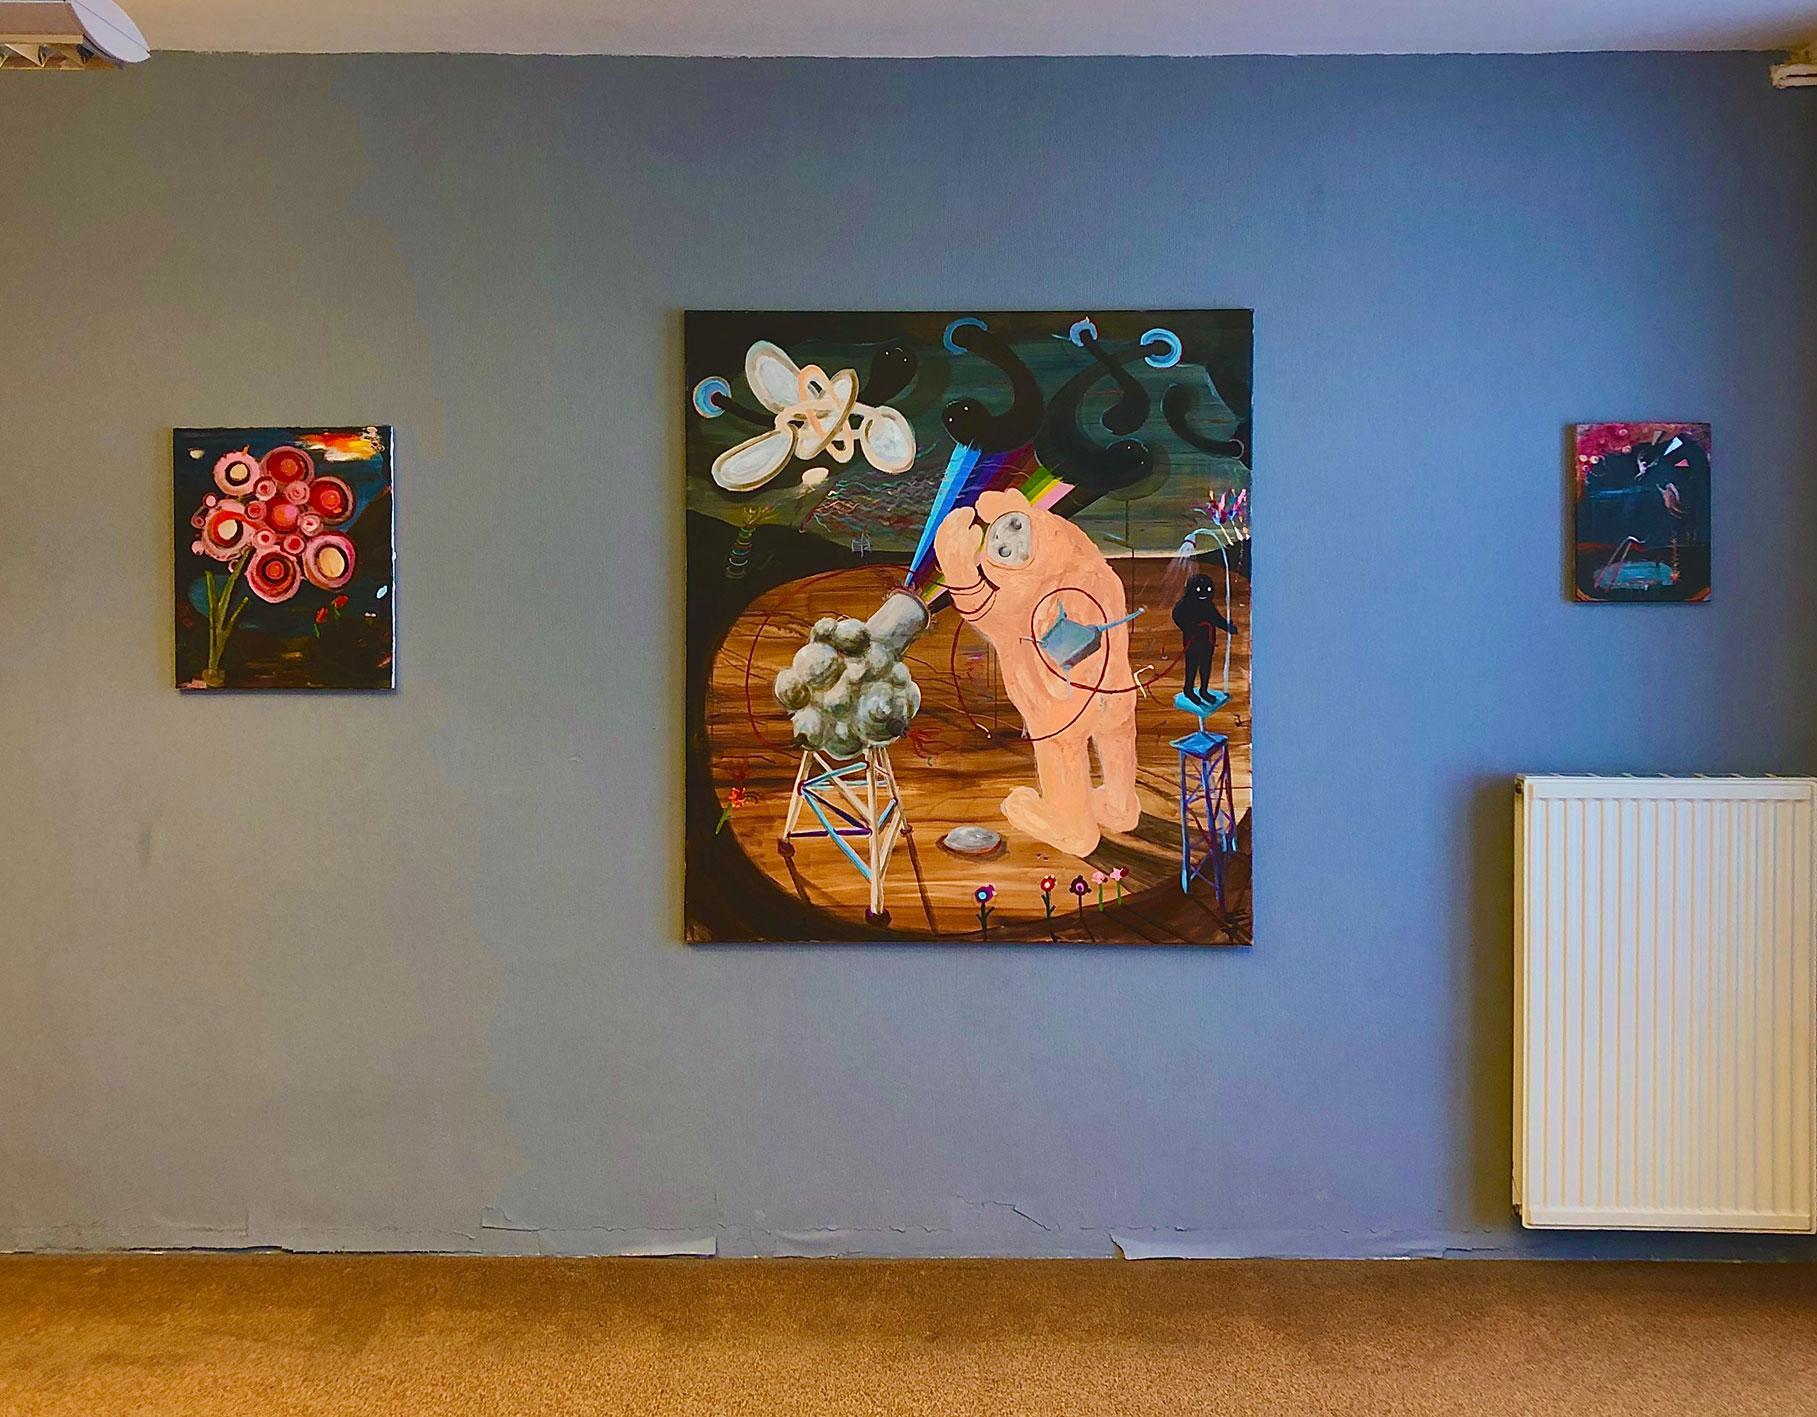 parallel art fair, vienna, Nicole gnesa gallery, review